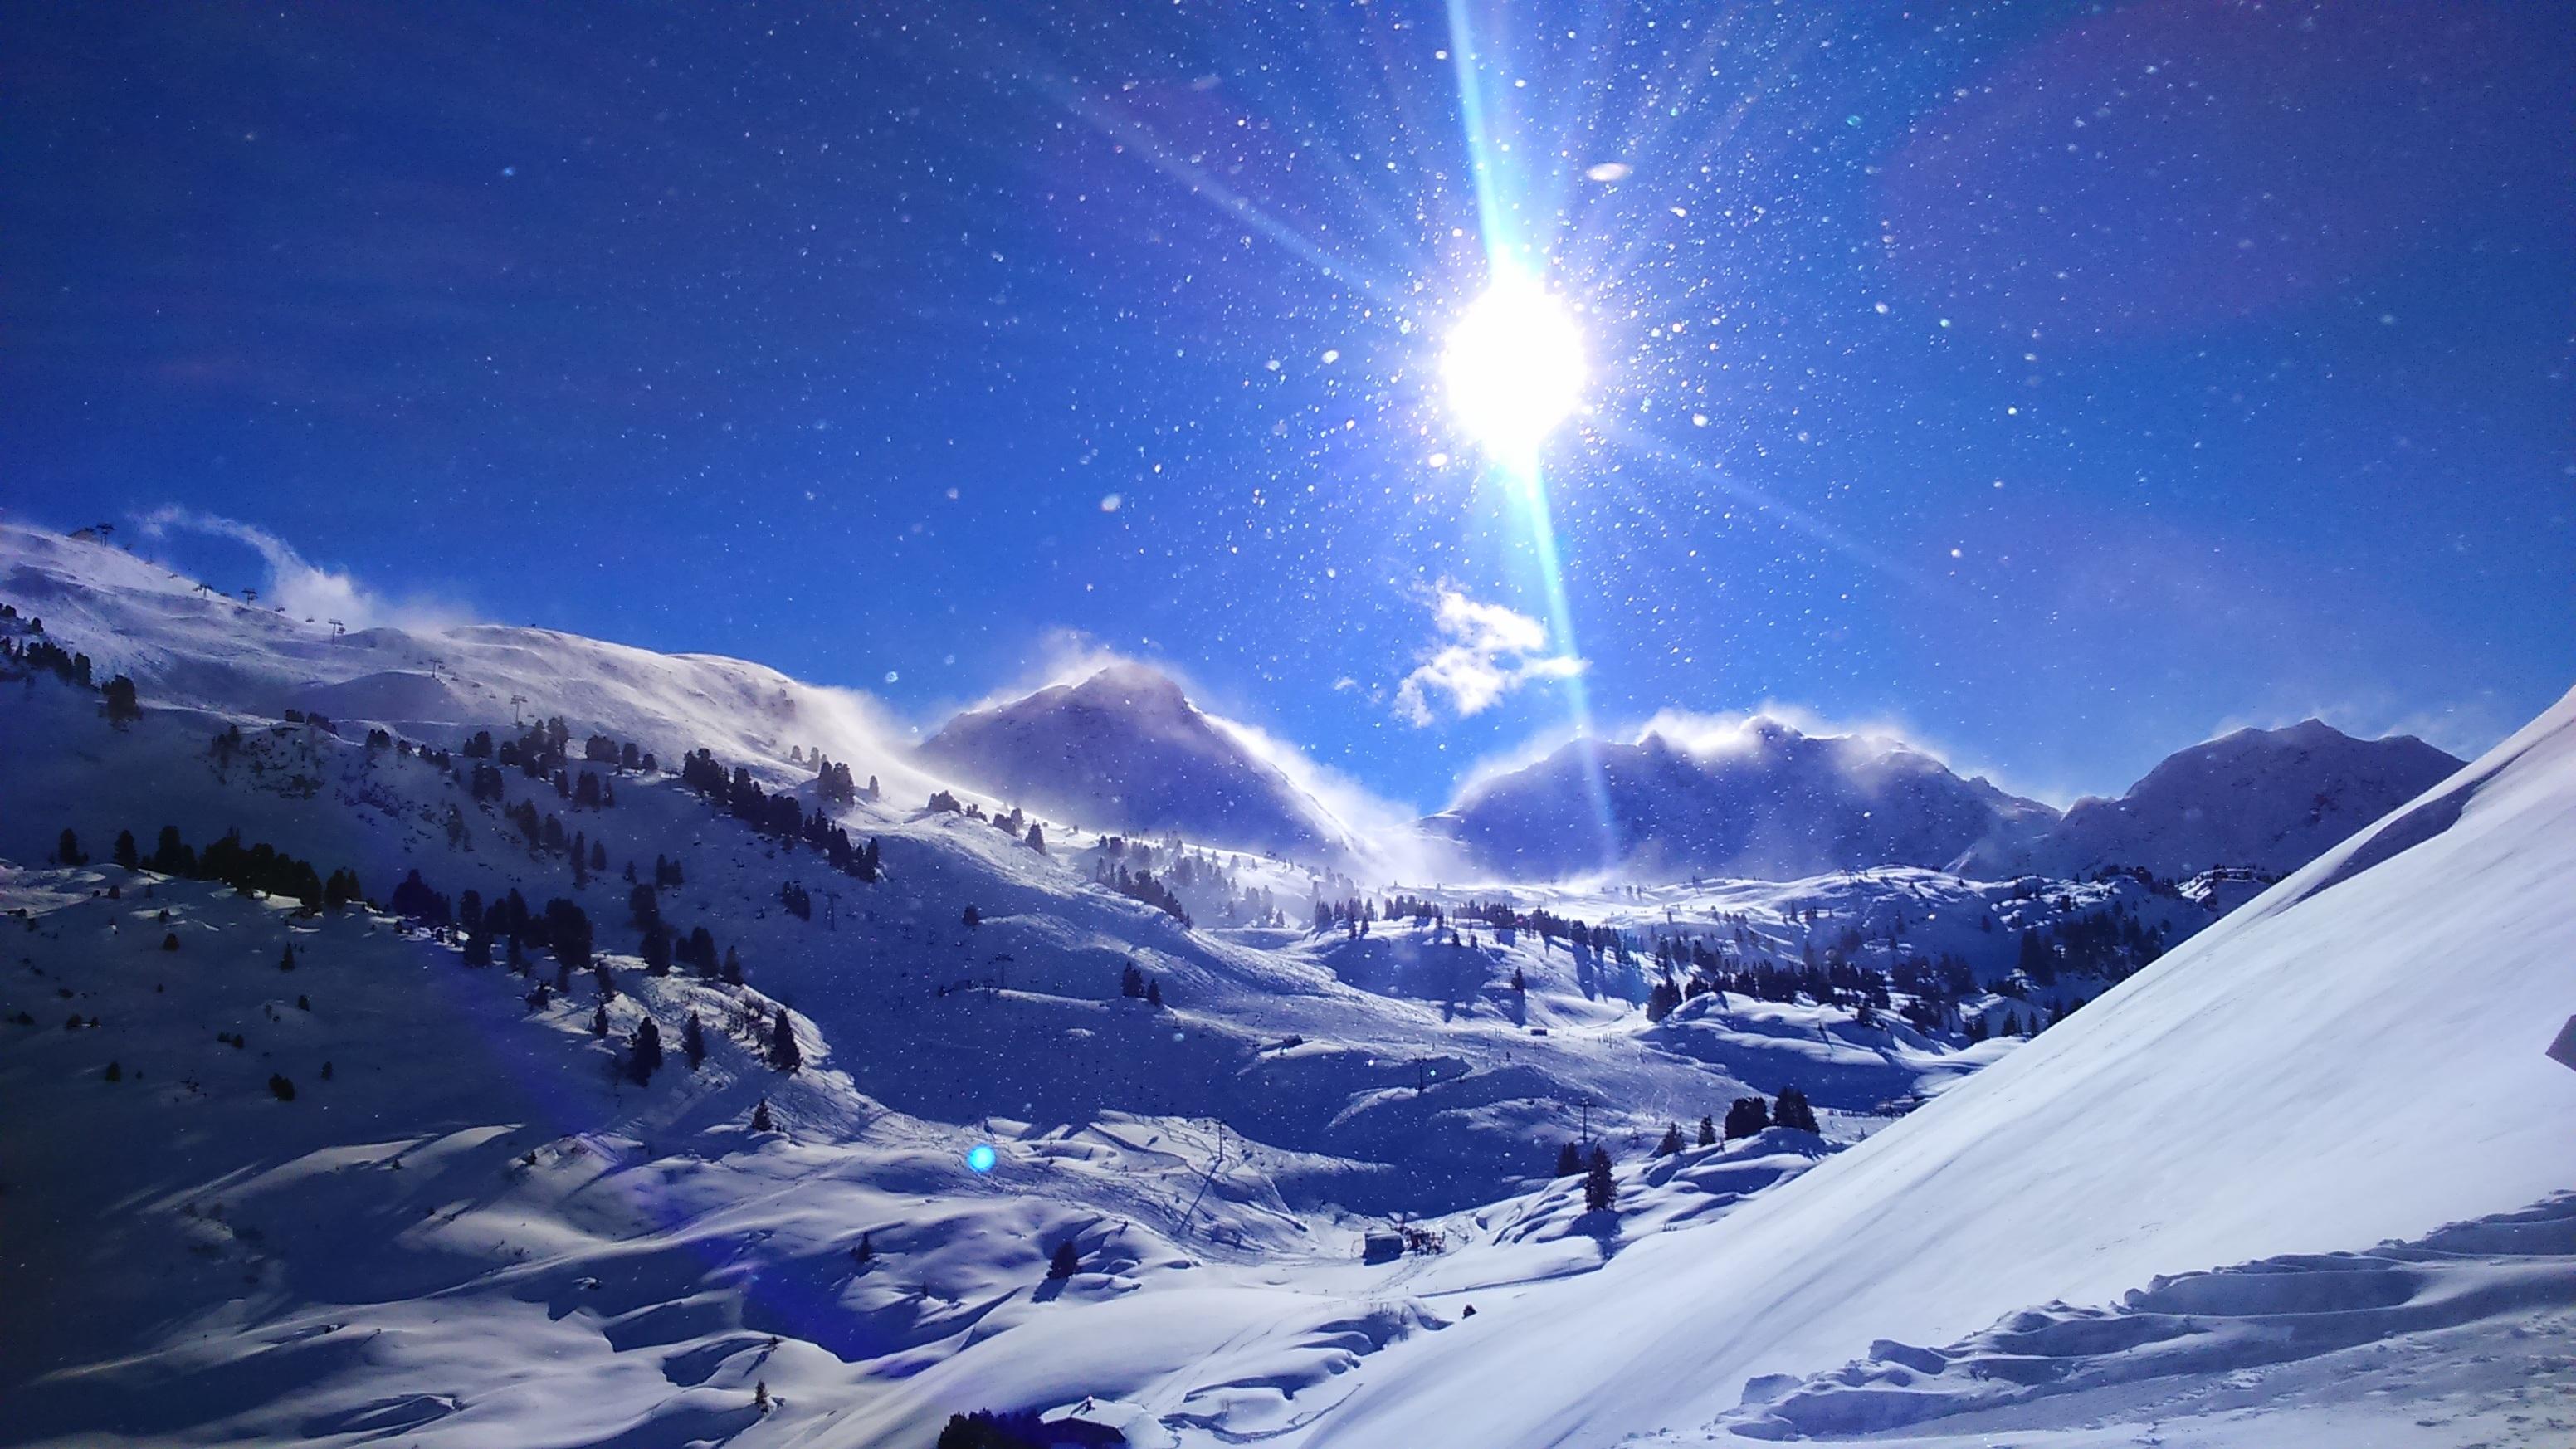 горы снег солнце фото салона районе педали